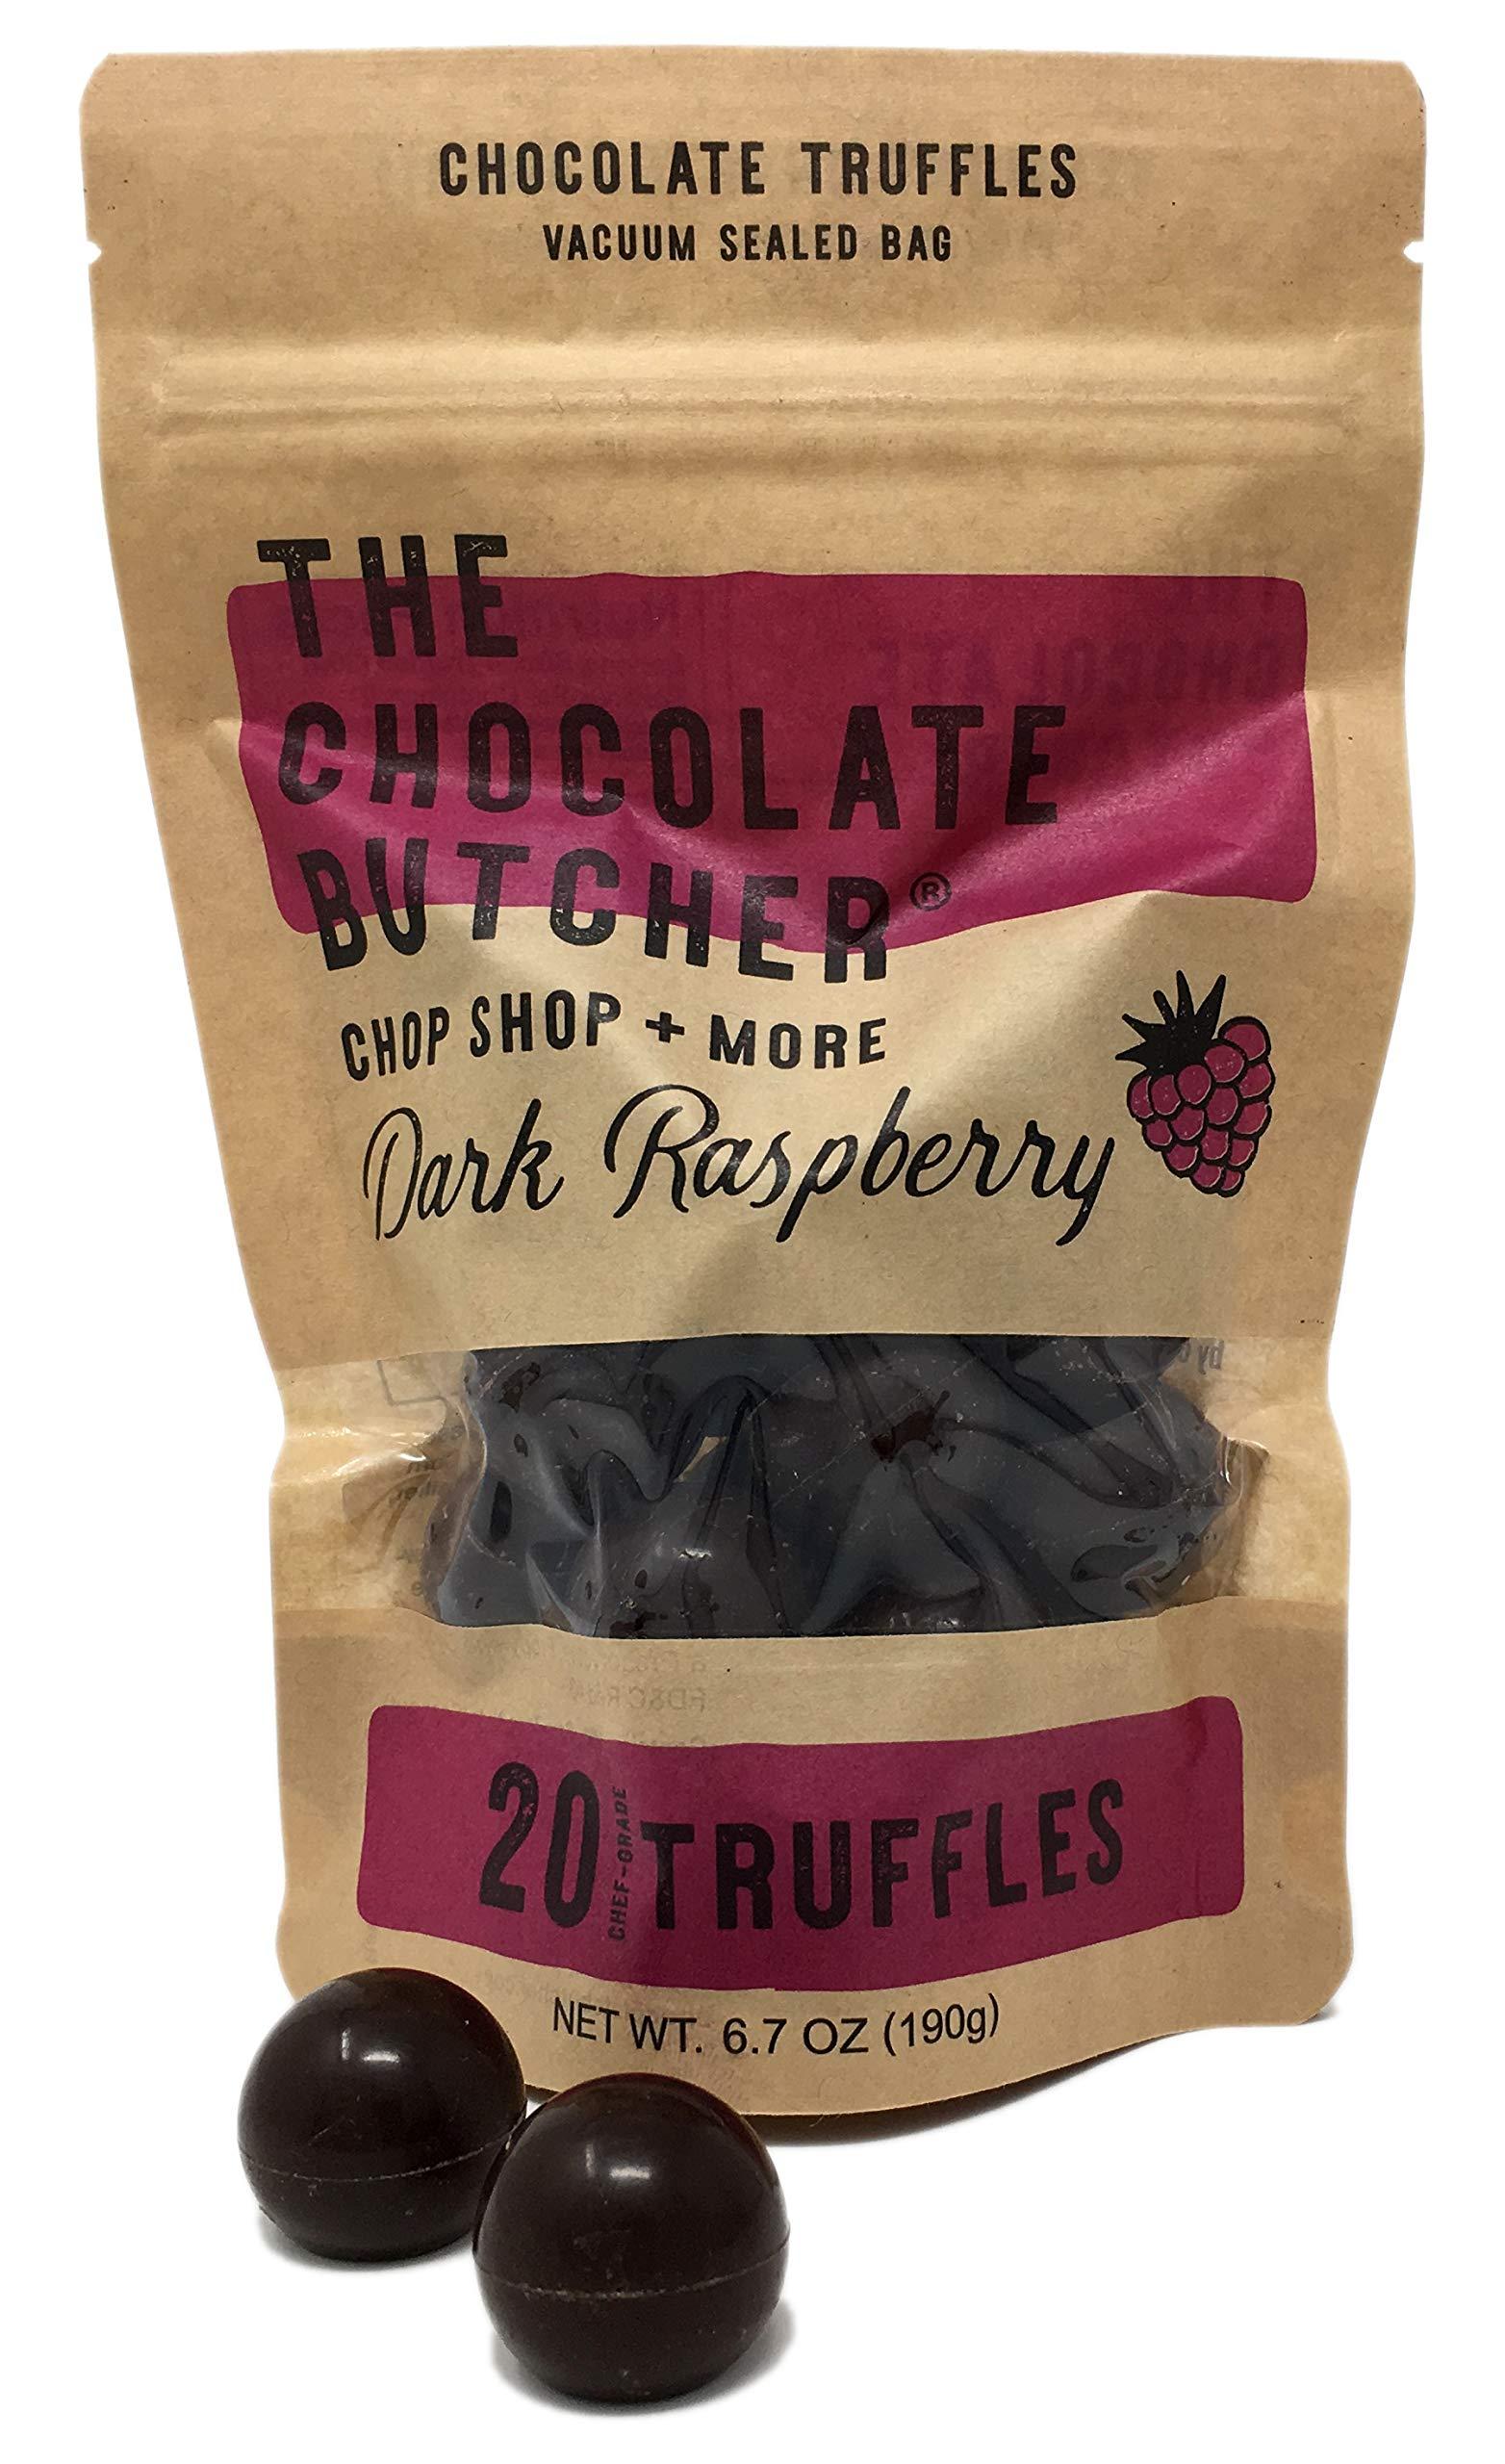 Chef-Grade Raspberry Dark Chocolate Truffles (One Bag-20 Truffles) by The Chocolate Butcher